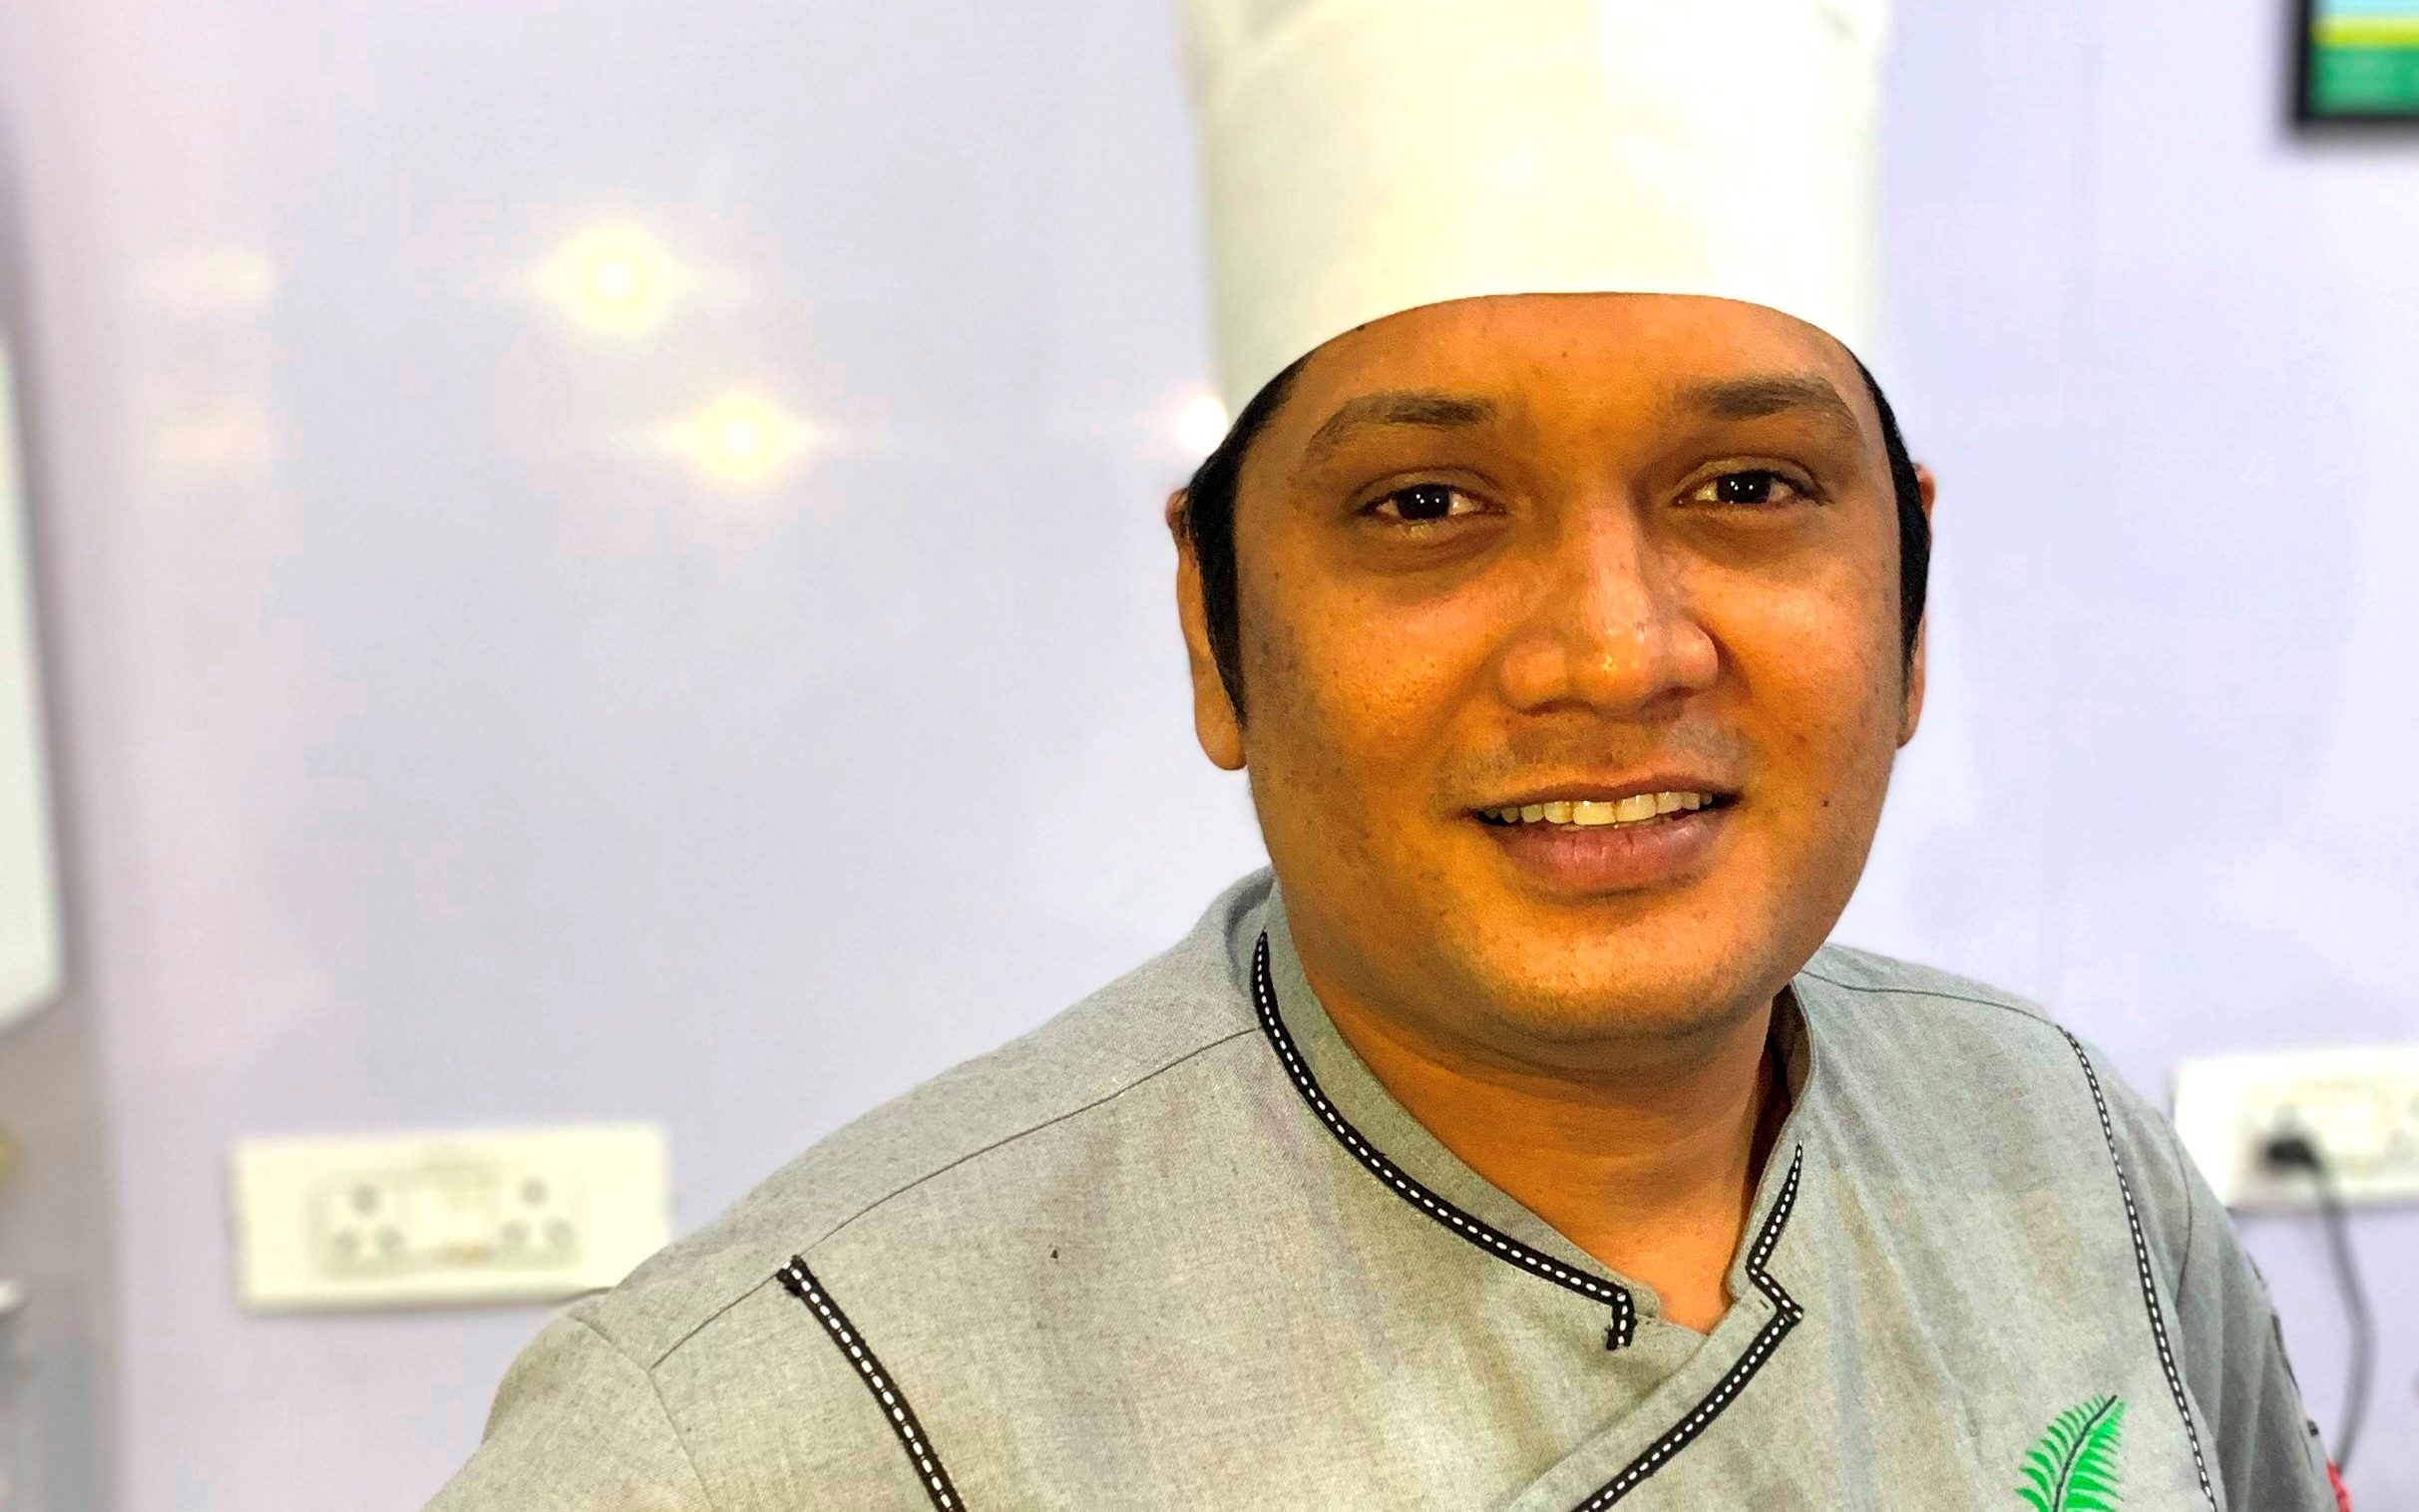 Debabrata edited Favourite Chocolate Delight : Exec Chef Debabrata Mukherjee, The Fern, Goregaon